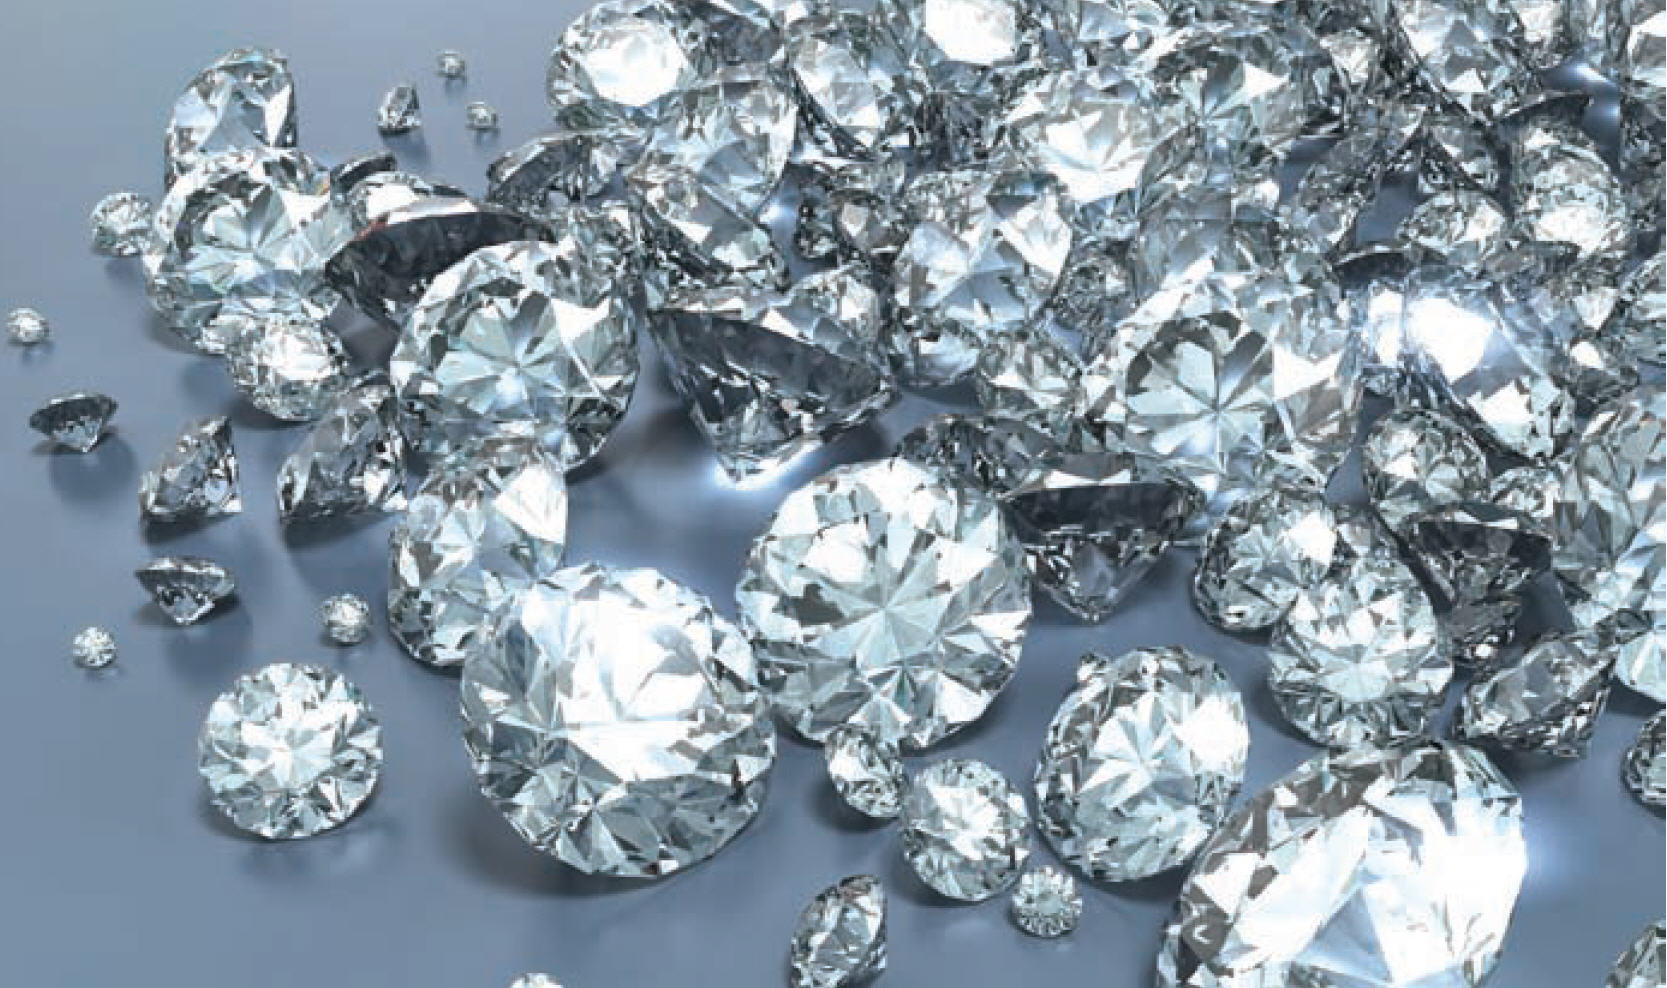 Tiffany to polish diamonds in Cambodia